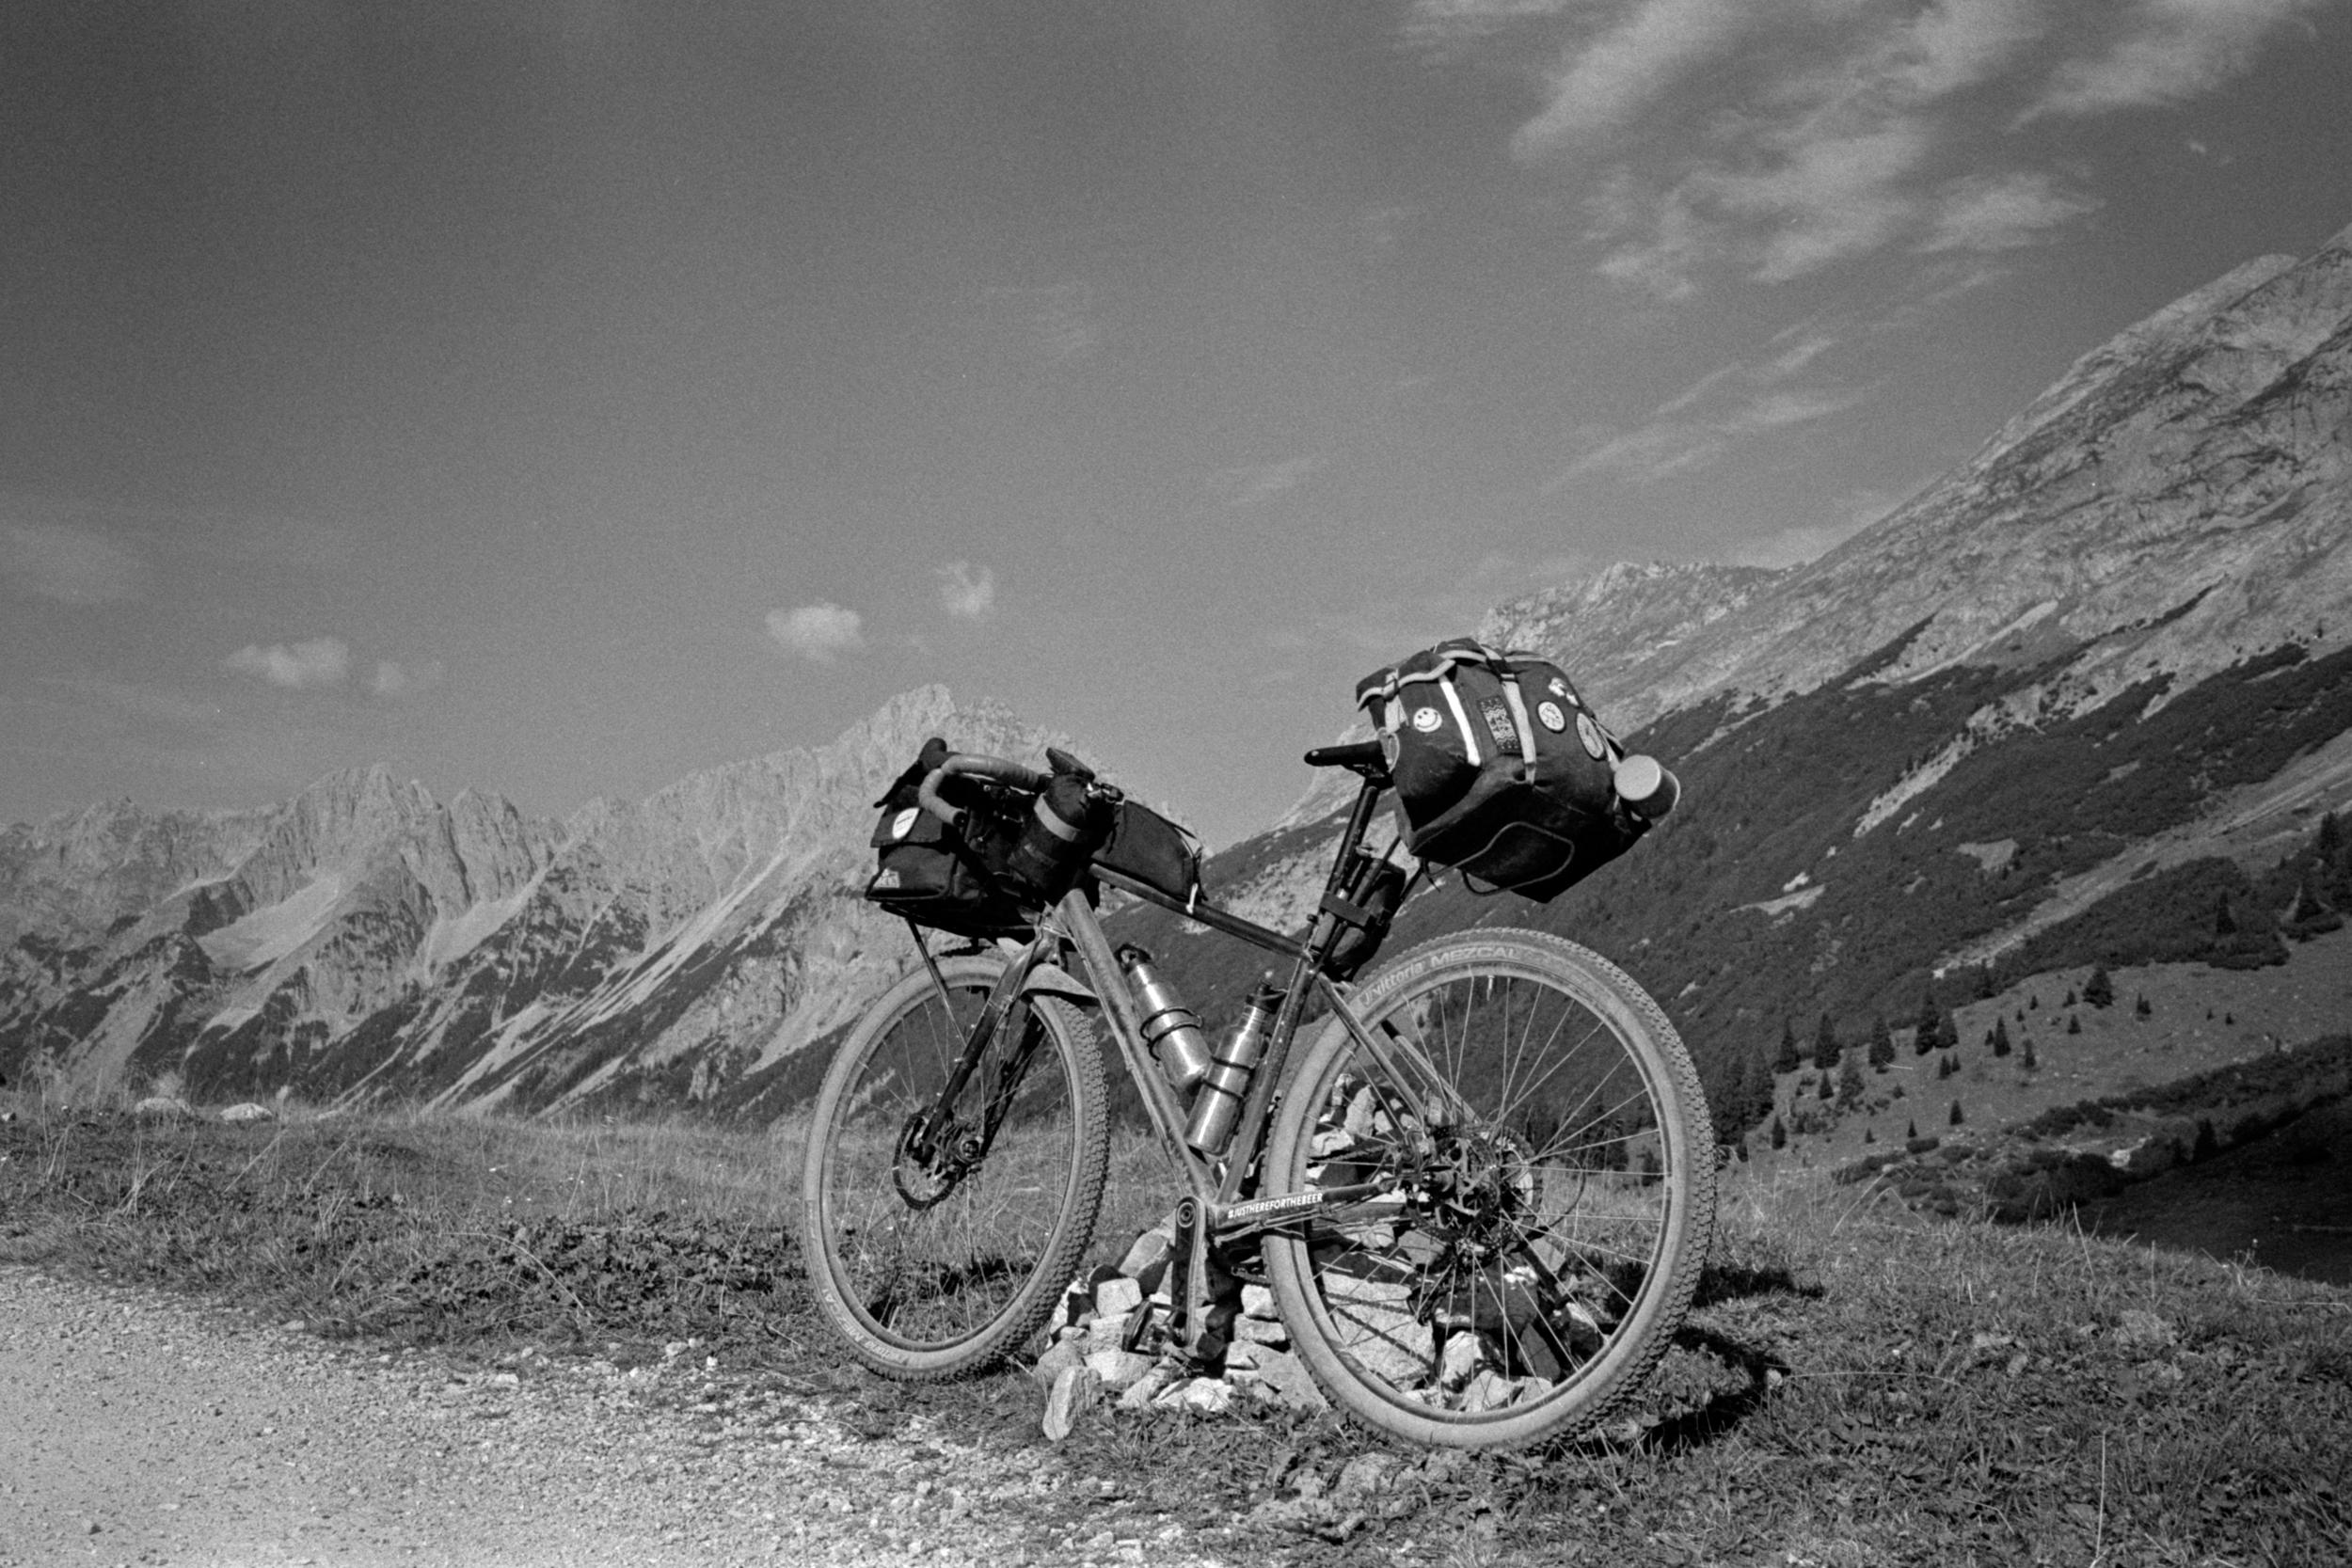 Bombi im Karwendel - Pic by André Kniepkamp